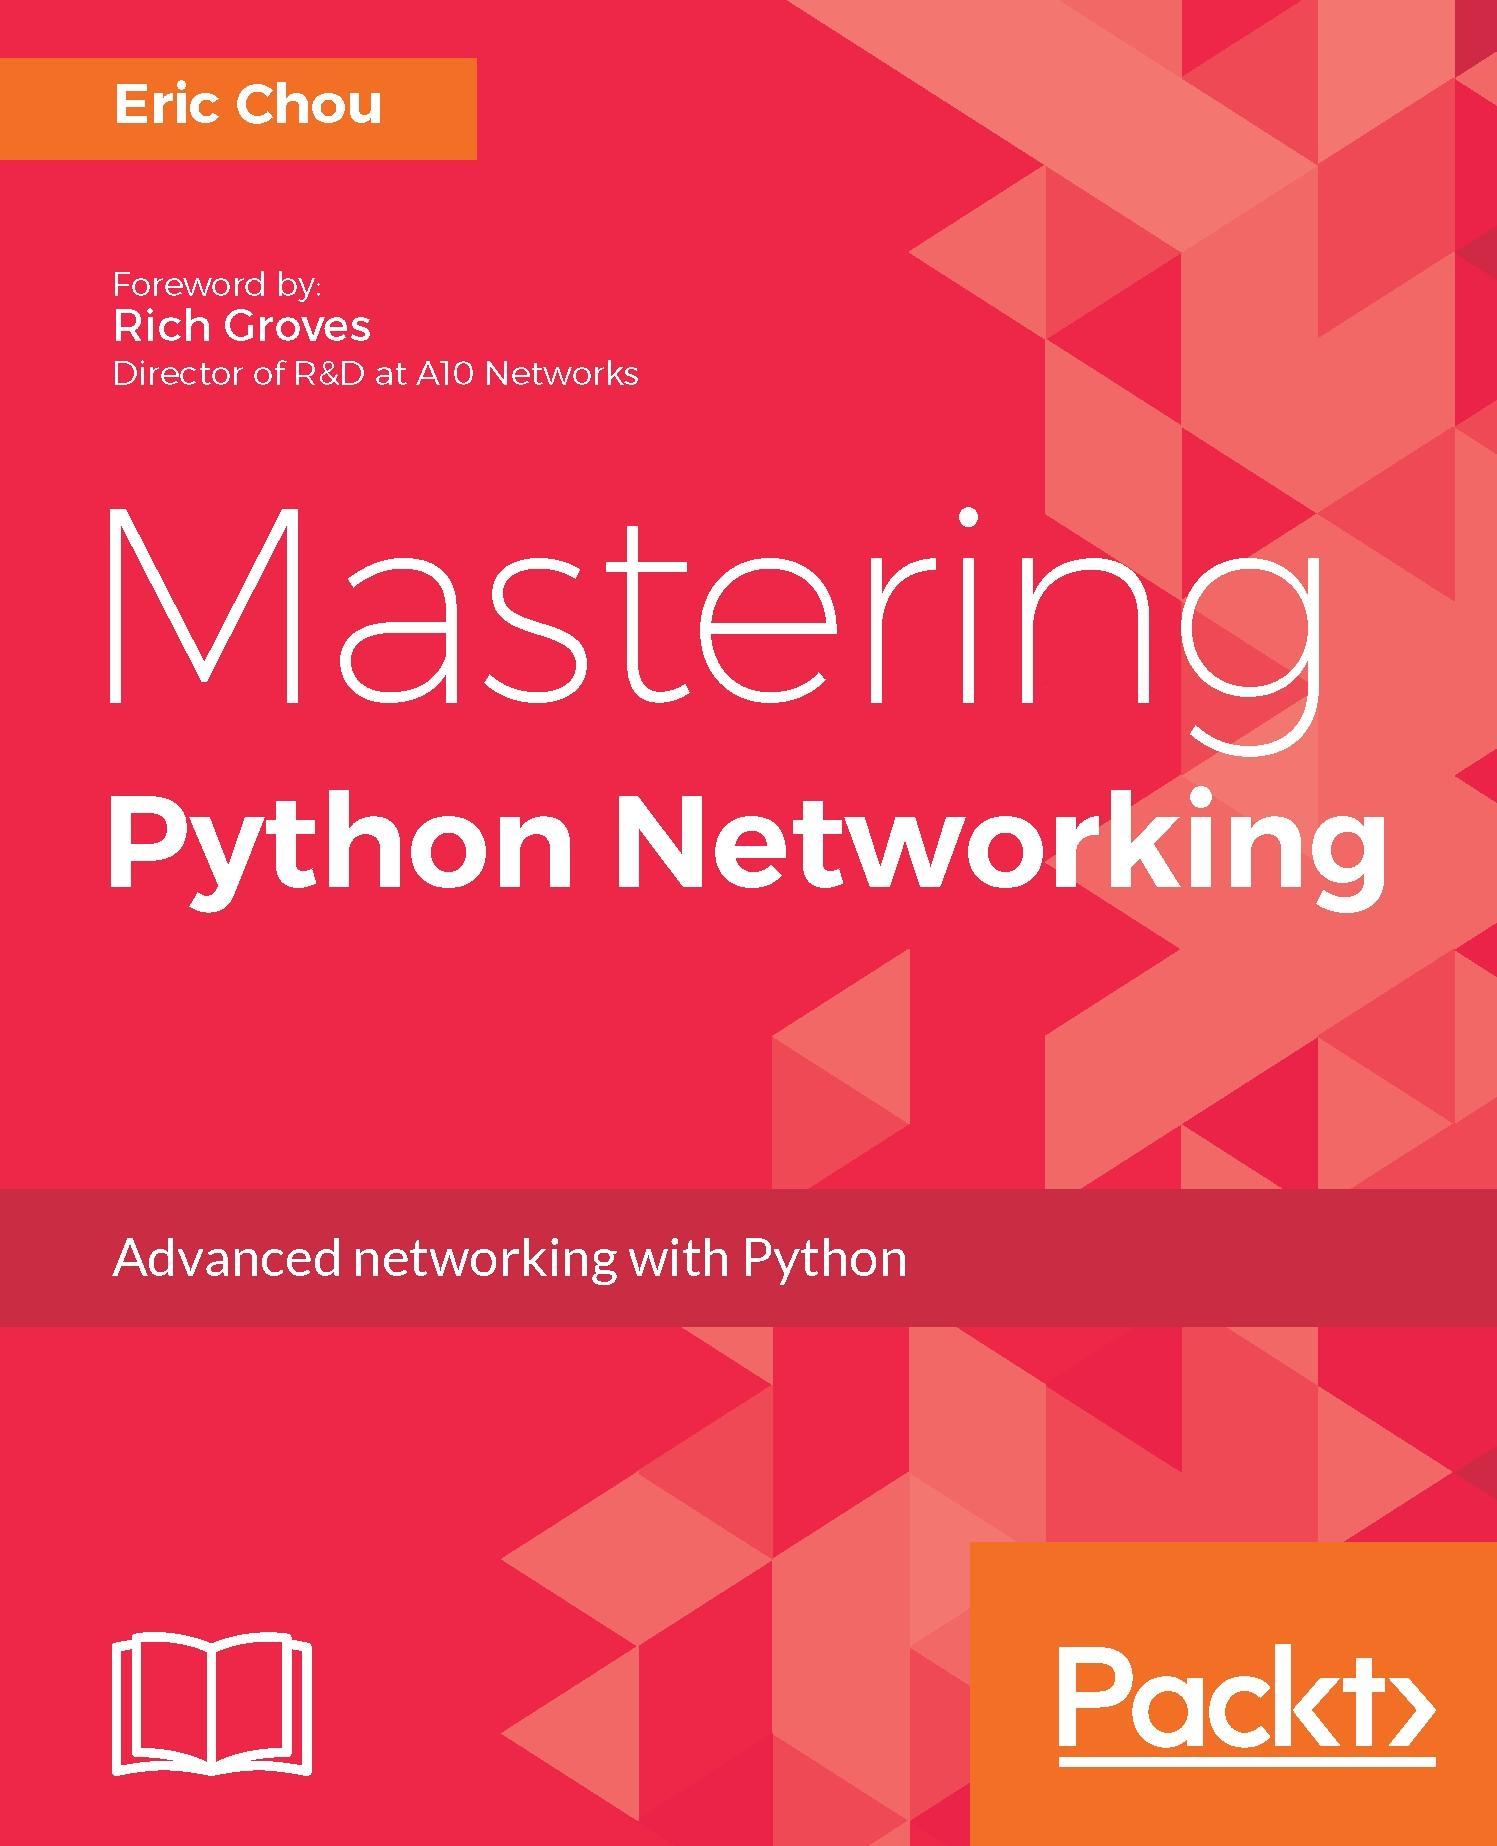 Mastering Python Networking